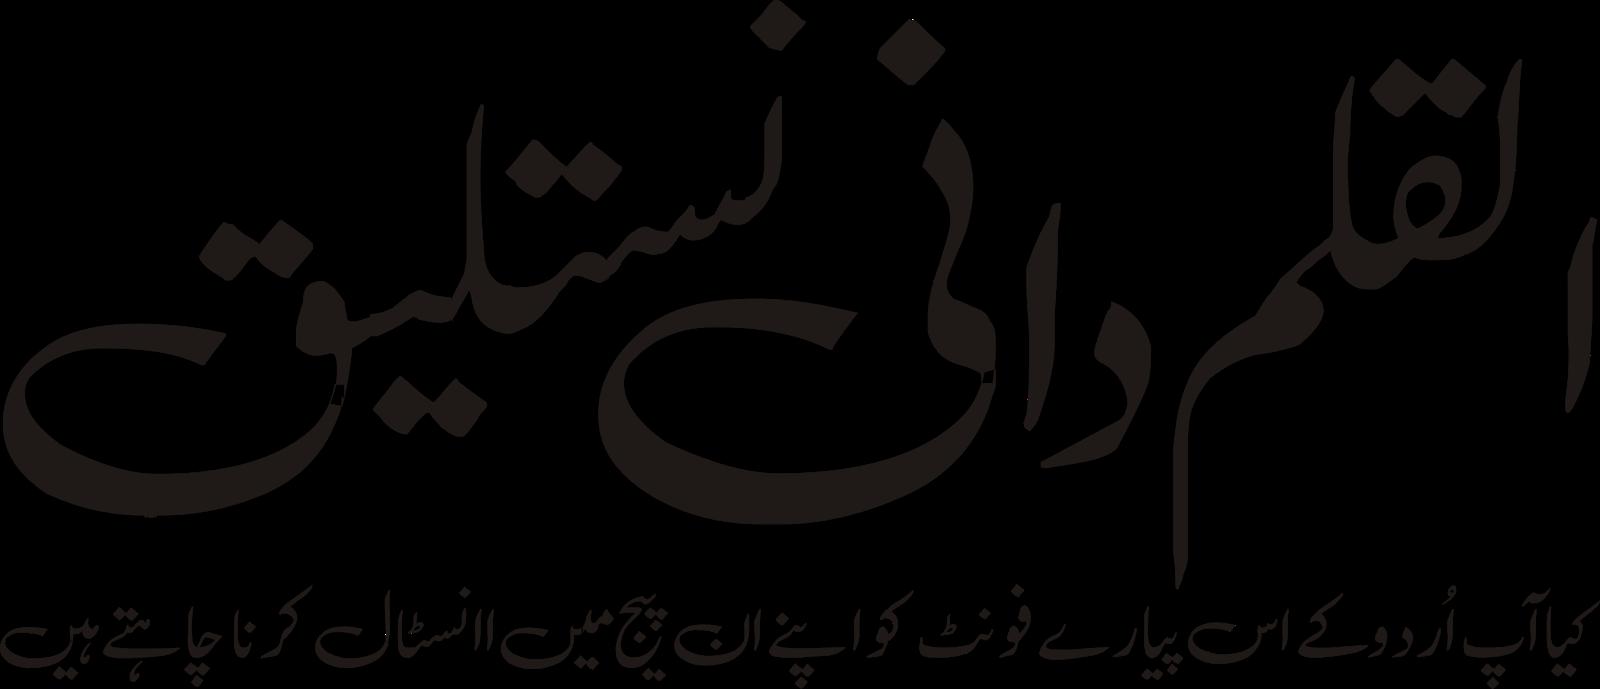 AIO Store: Al Qalam Dani Nastaleeq New Urdu Font 2019